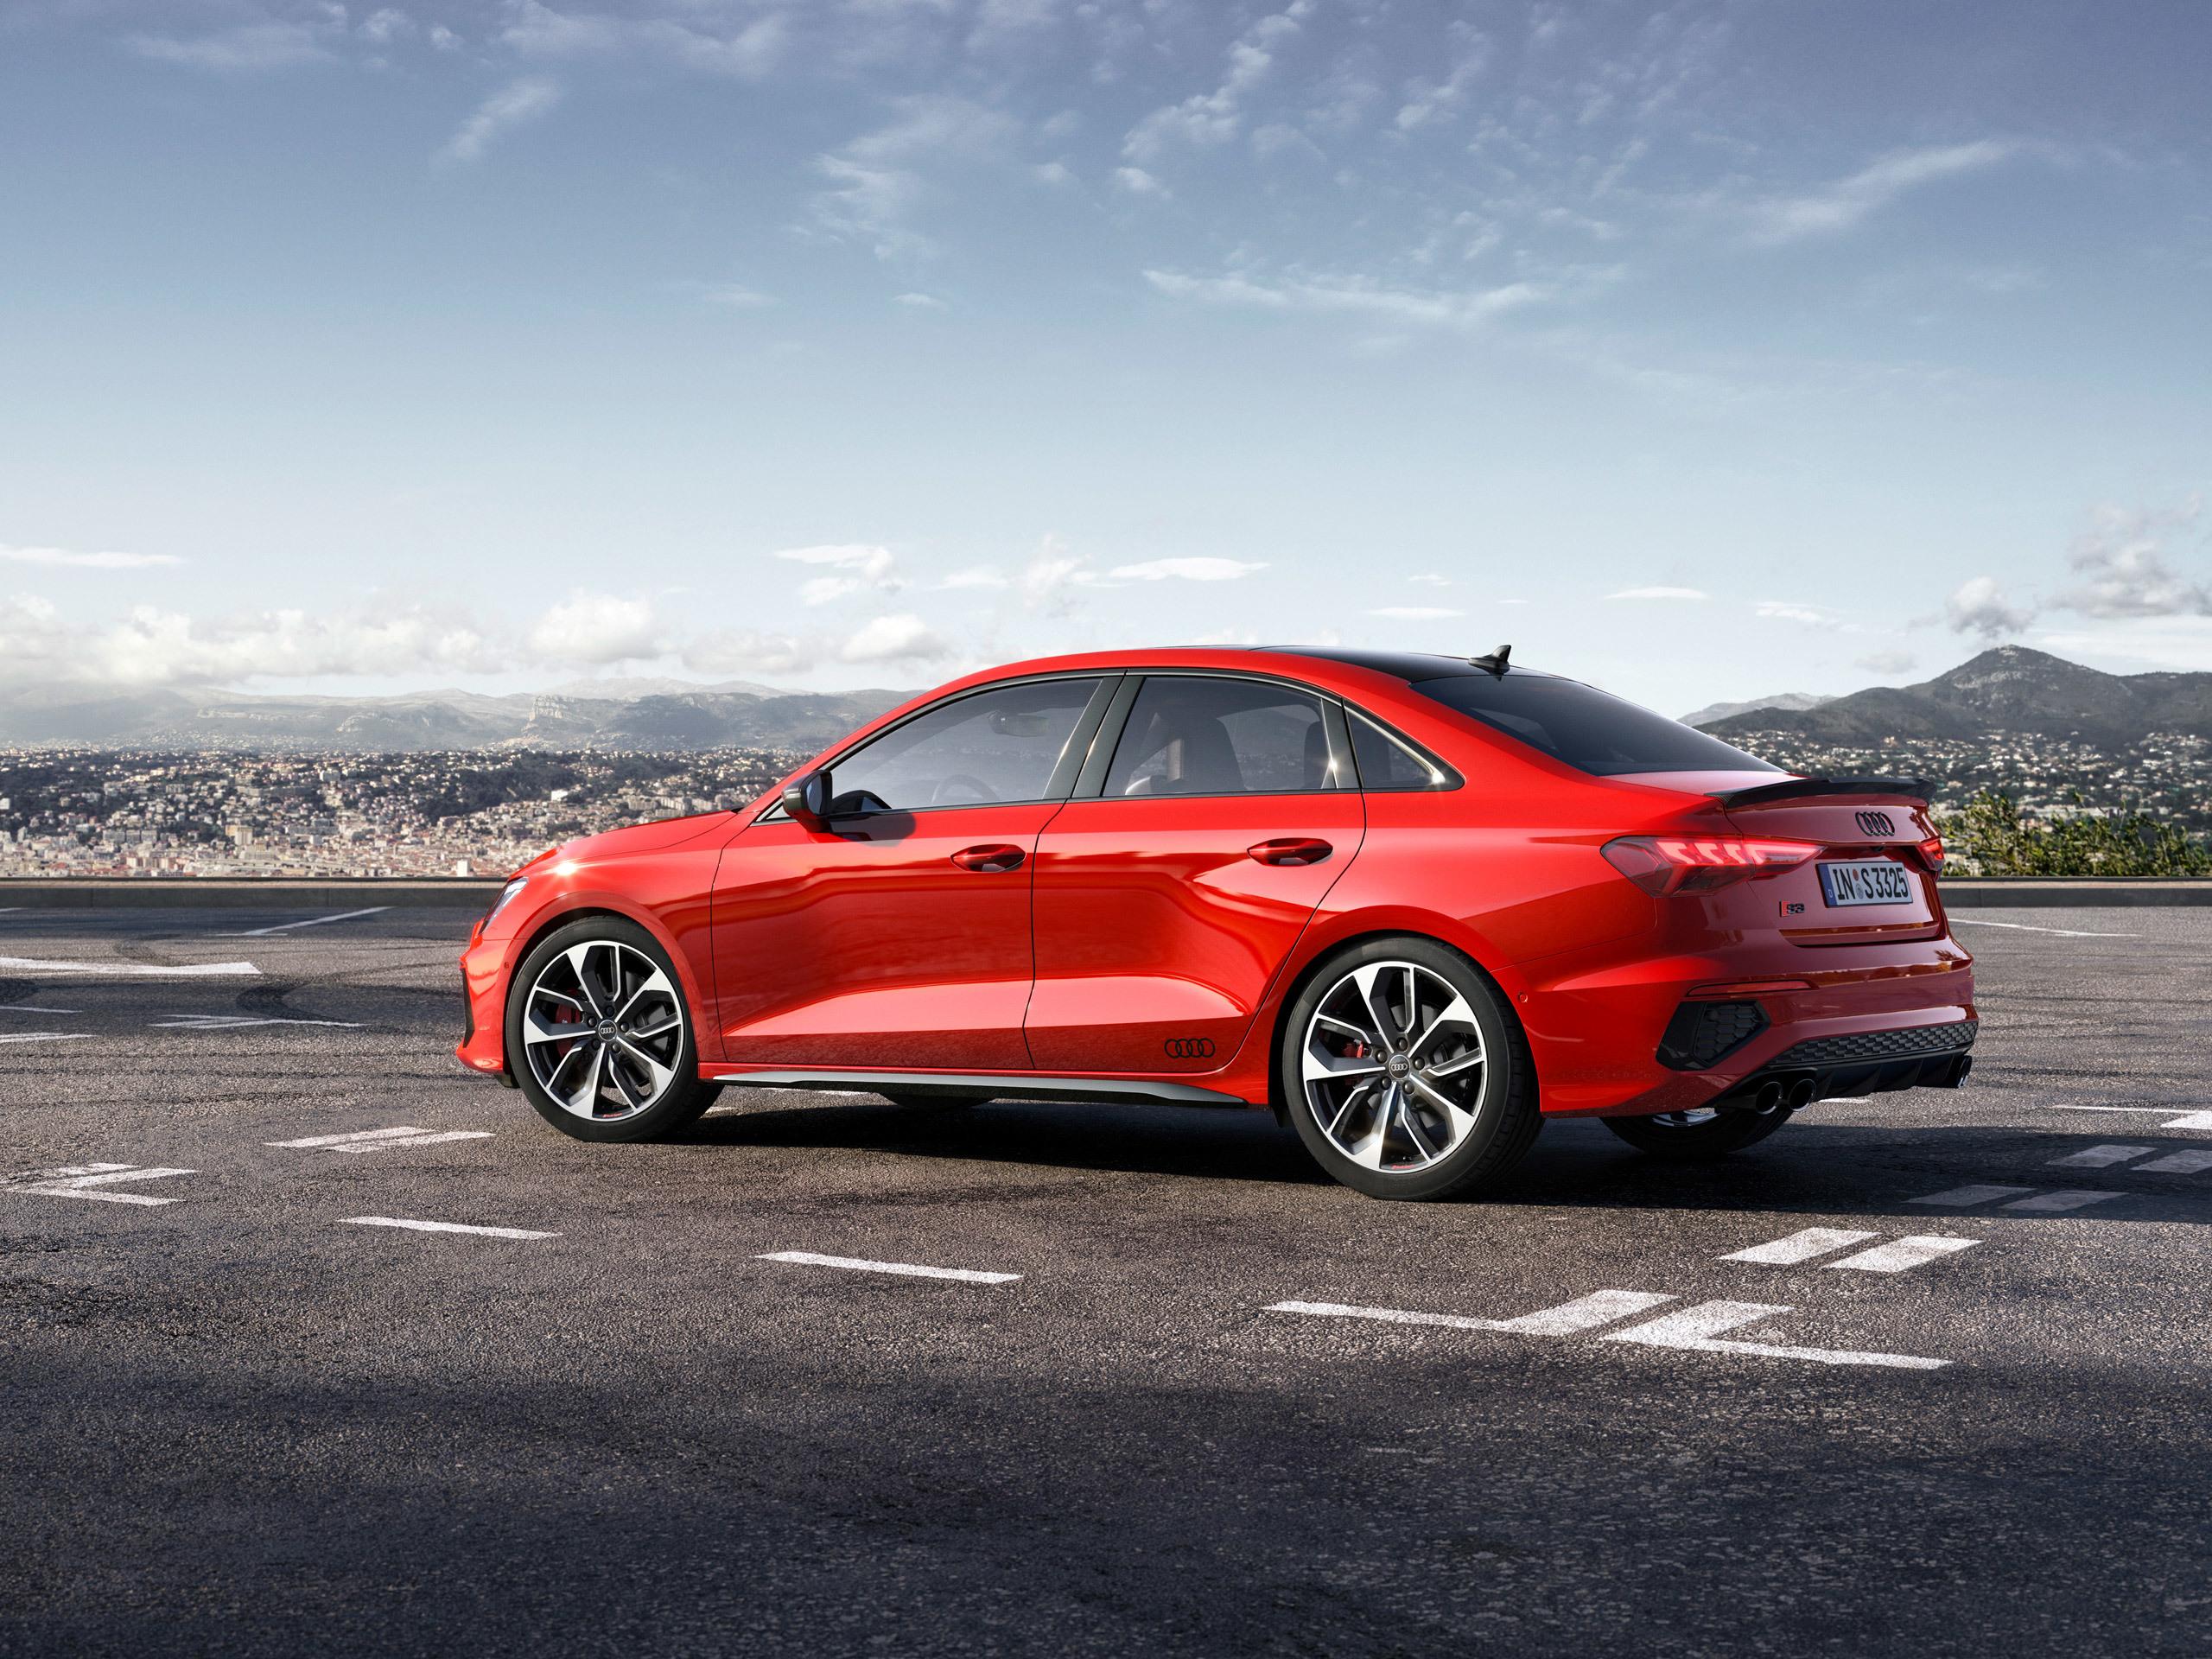 Audi S3 Sedan 2021 - アウディに嵌まる - 壁紙画像ブログ